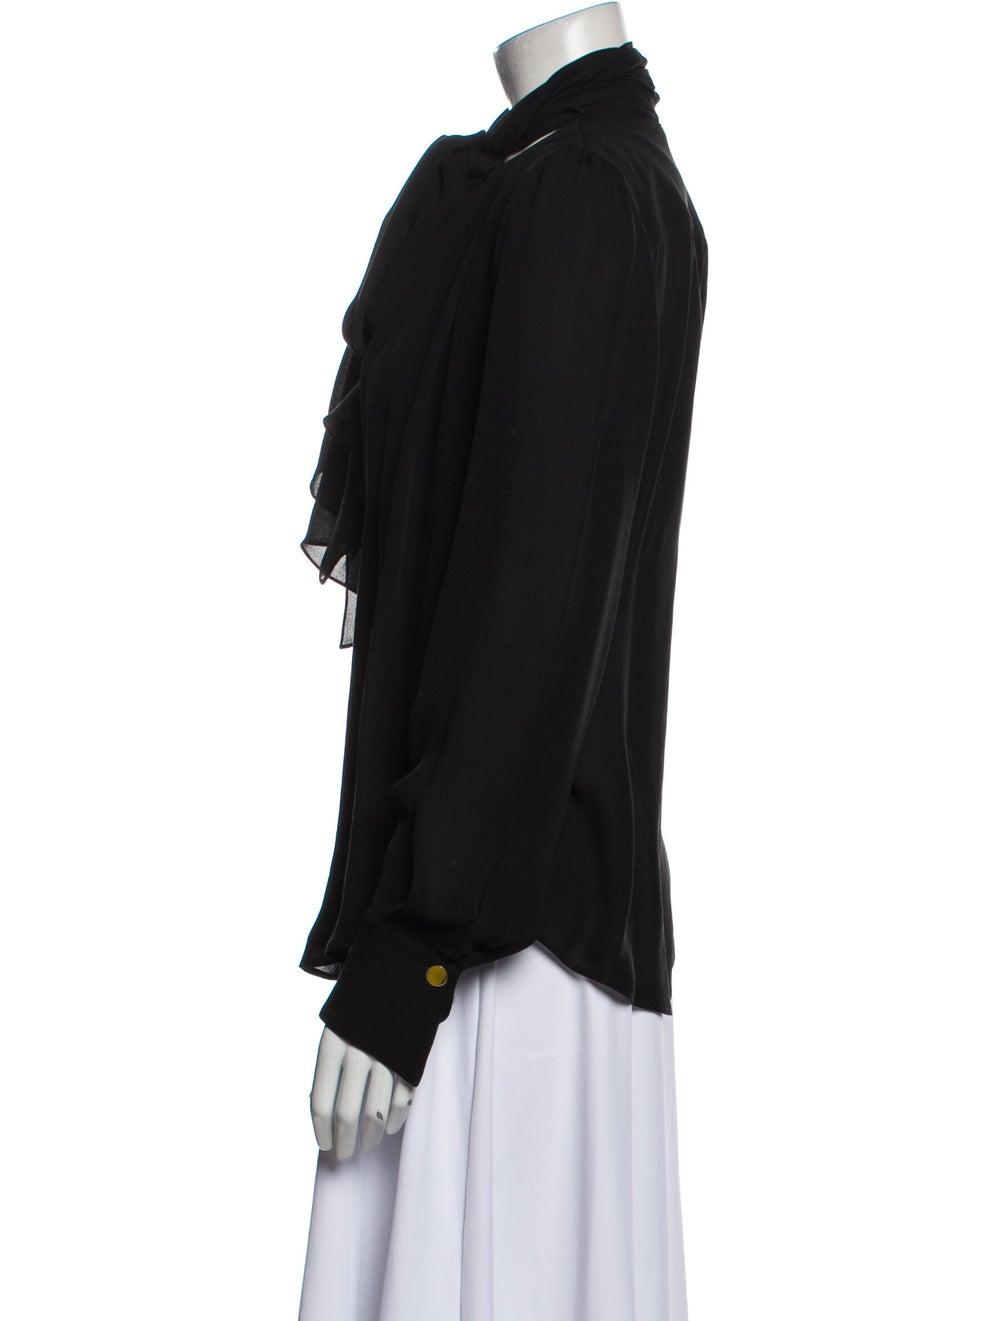 Plein Sud Silk Mock Neck Blouse Black - image 2